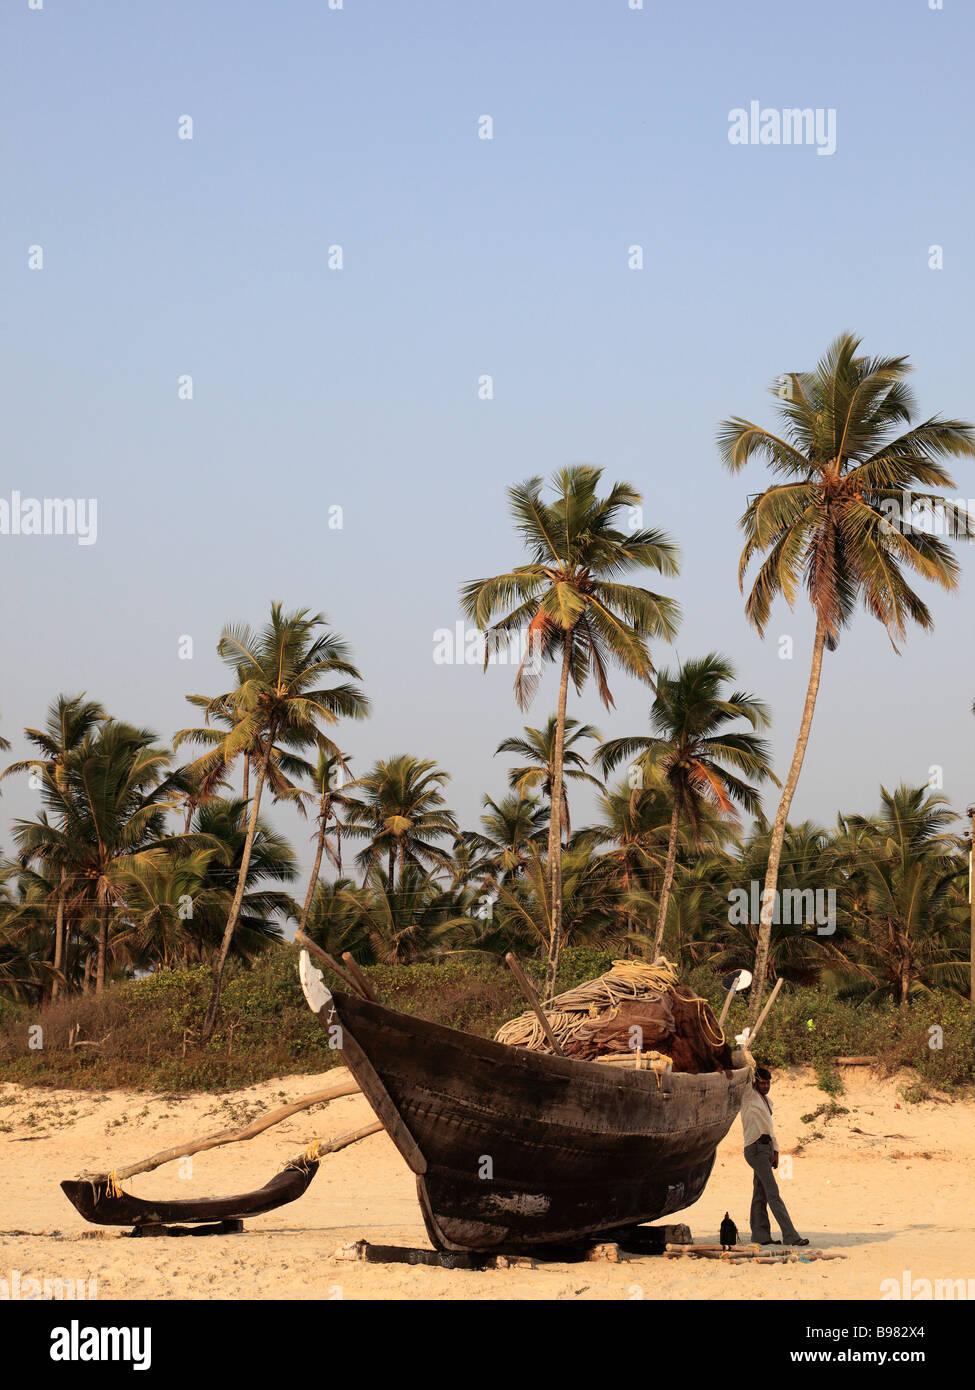 India Goa Colva beach fishing boat palms - Stock Image